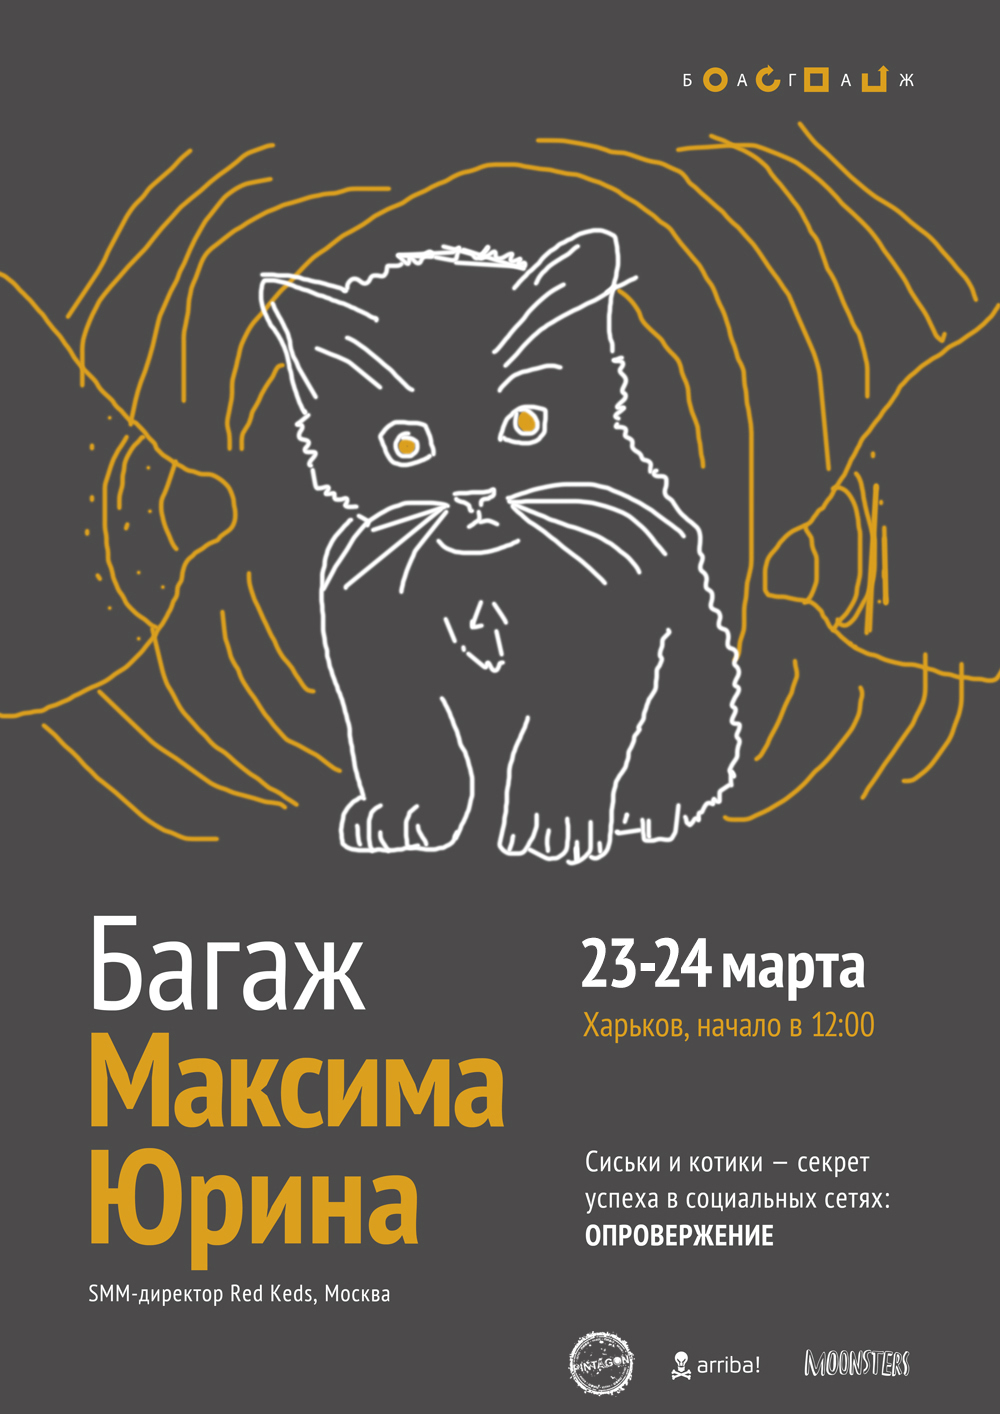 urin_kharkov